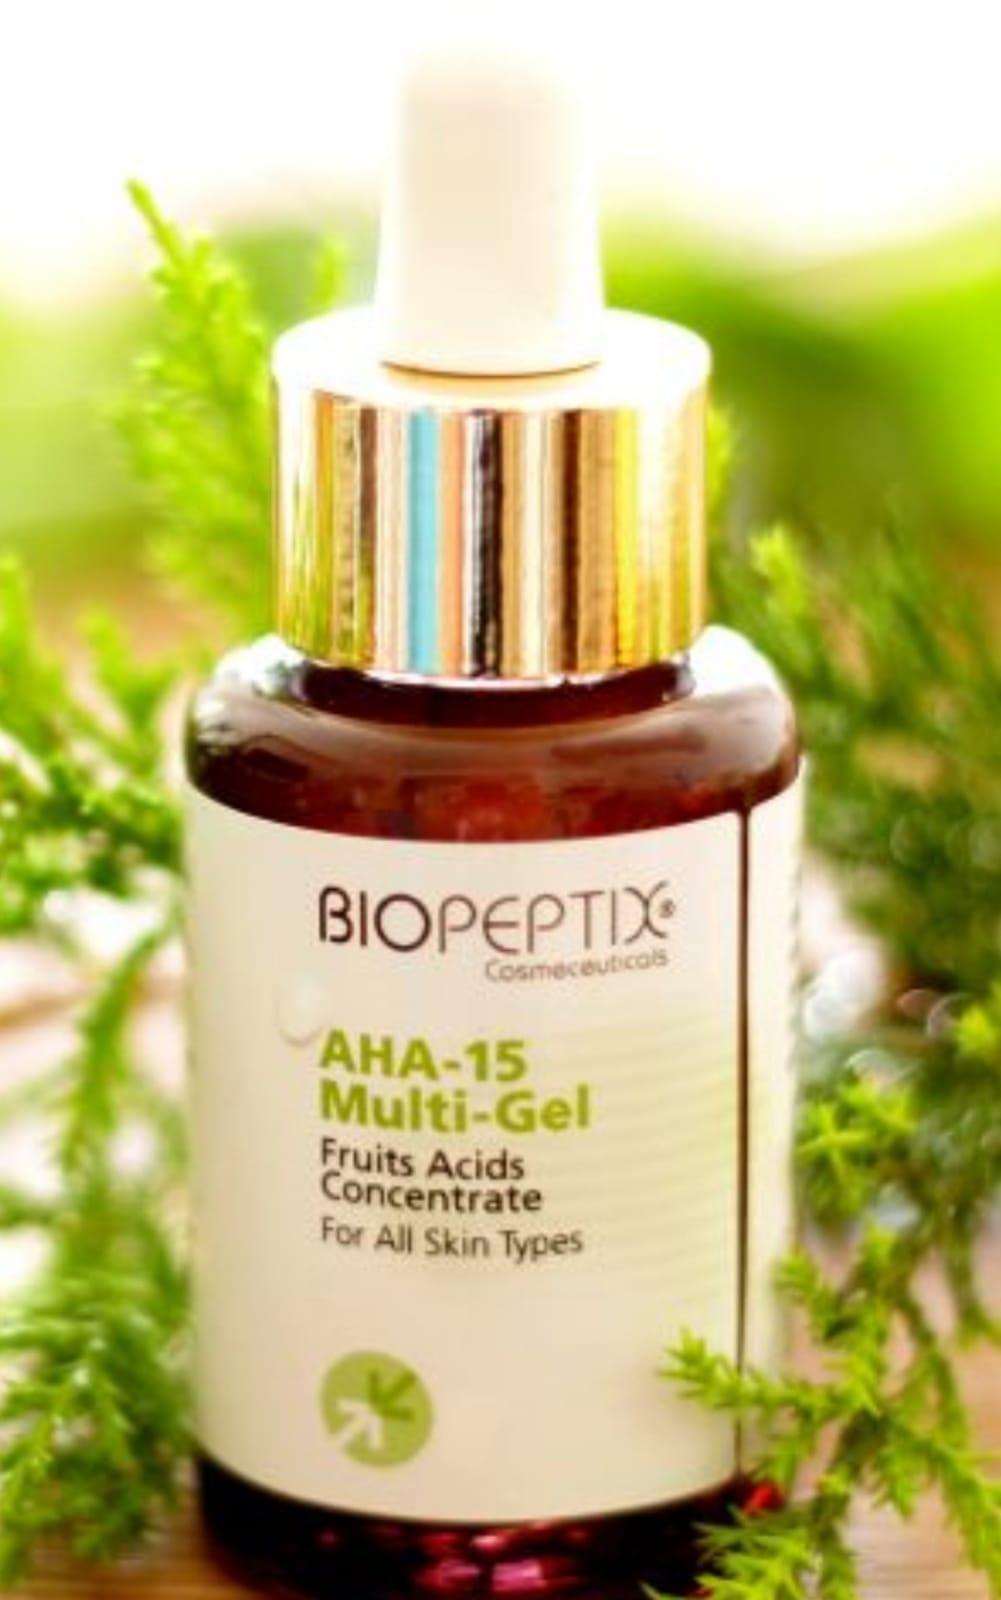 AHA-15 Multi-Gel של Biopeptix